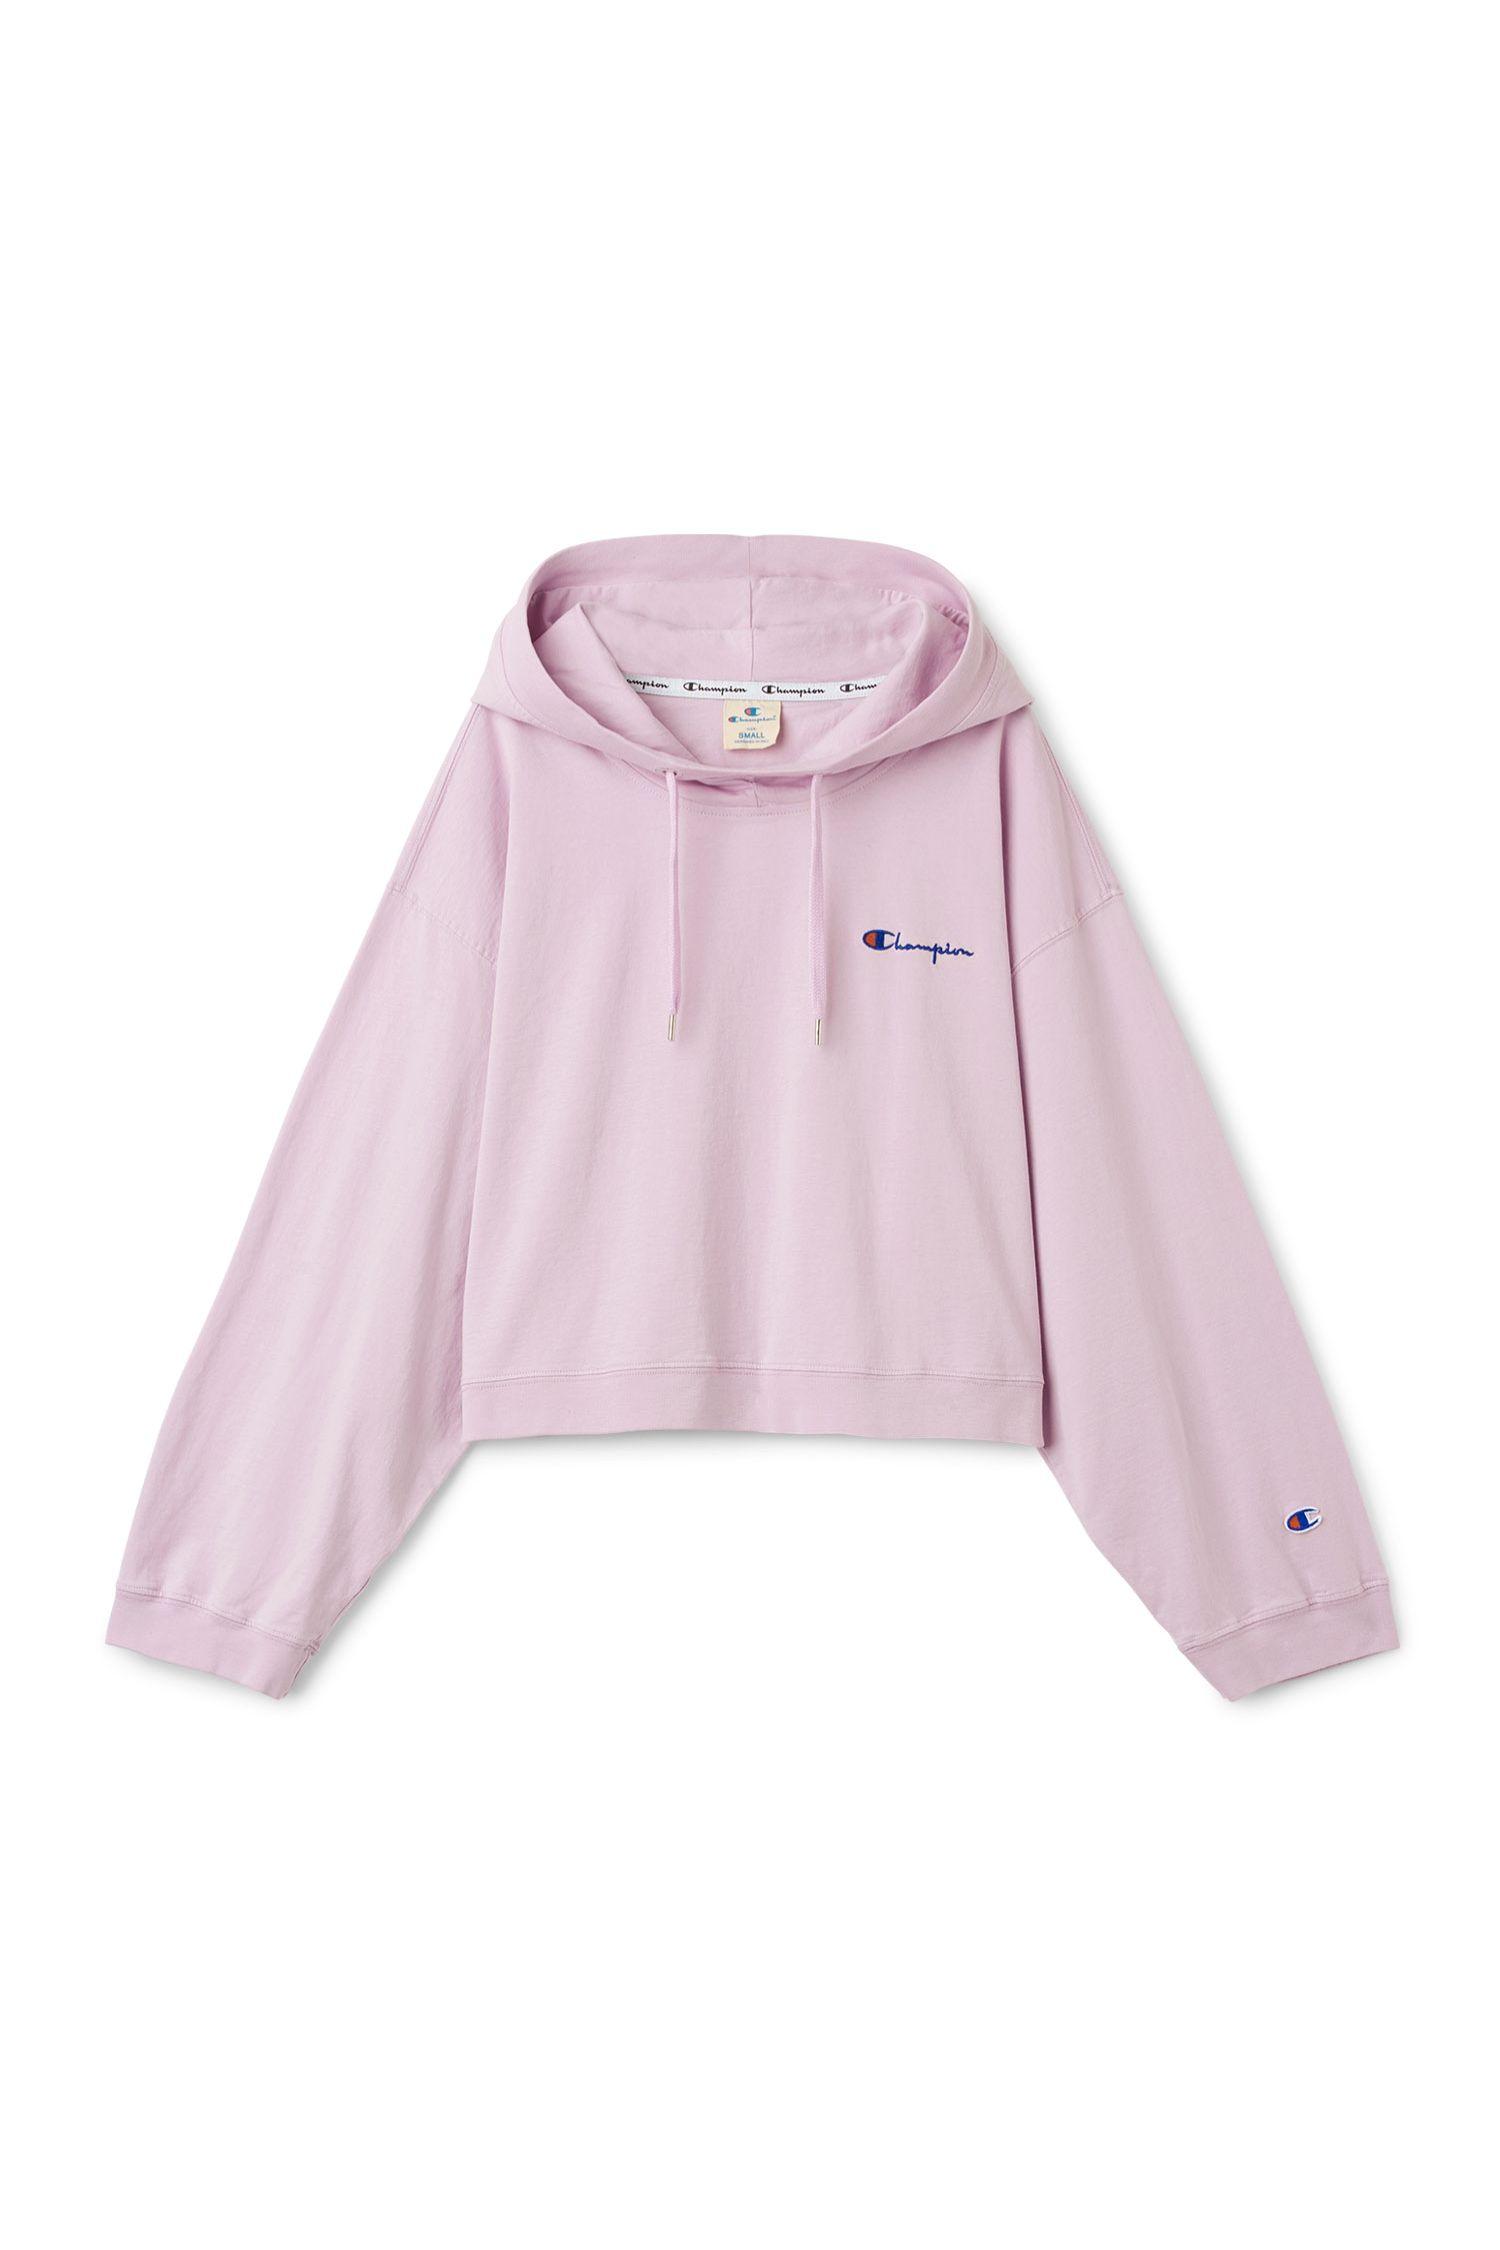 Weekday Image 9 Of Dash Cropped Hoodie In Pink Light Tailored Clothes Cropped Hoodie Sweatshirts Hoodie [ 2250 x 1500 Pixel ]